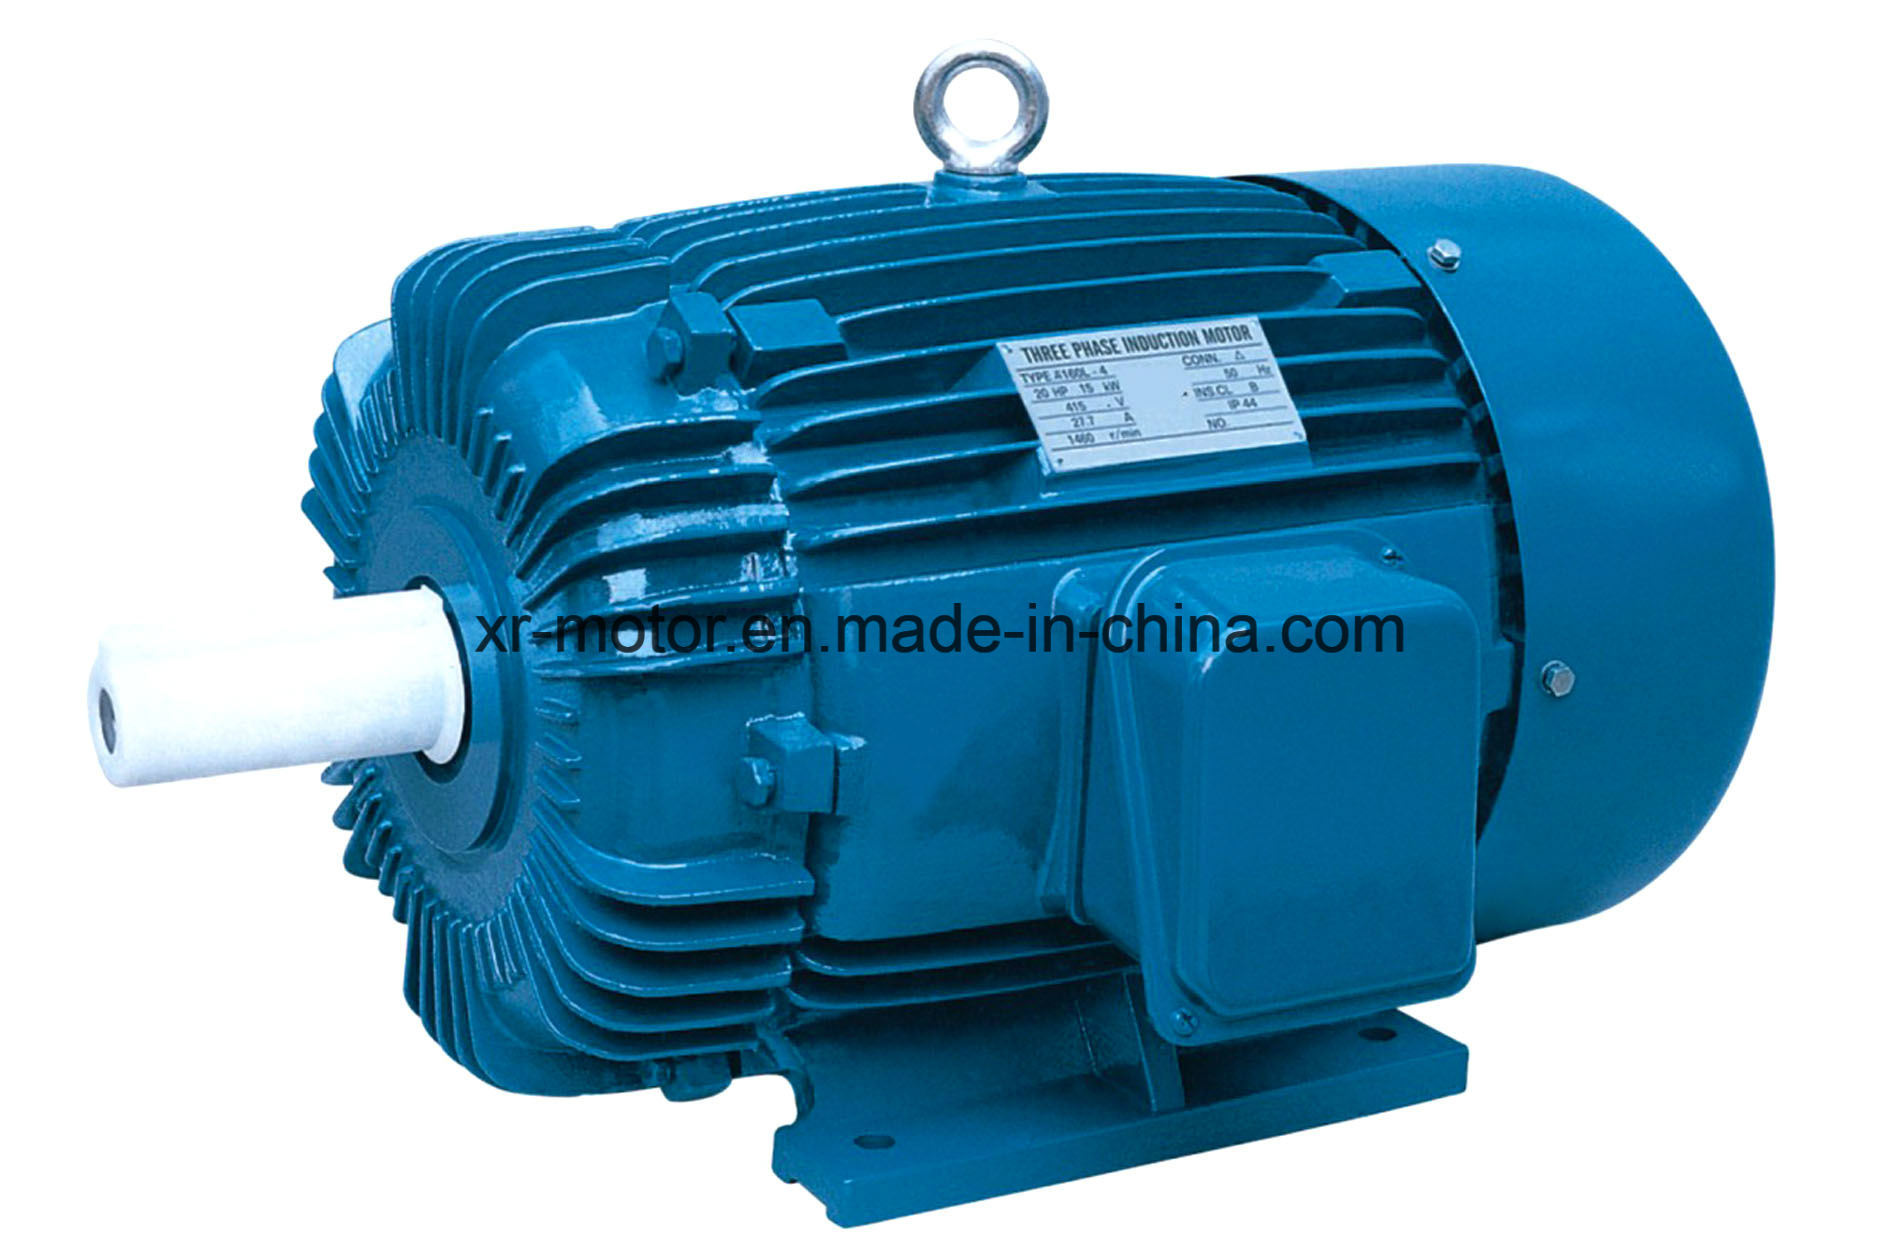 China Three Phase Brushless Electric Motor 40kw Price - China ...